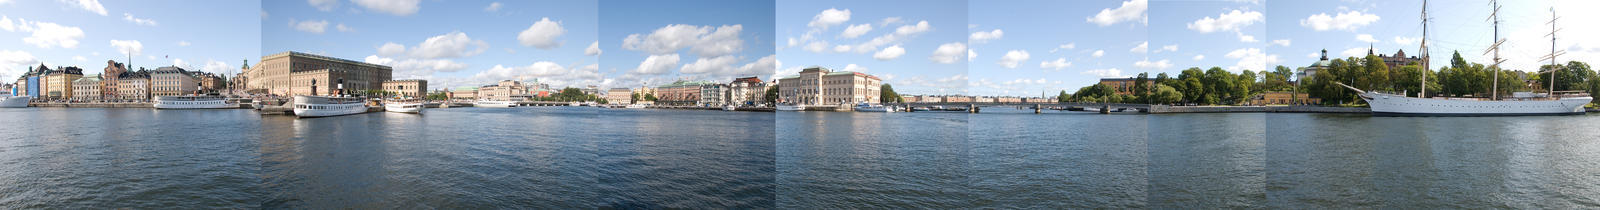 Stockholm 2 by Ashstorm